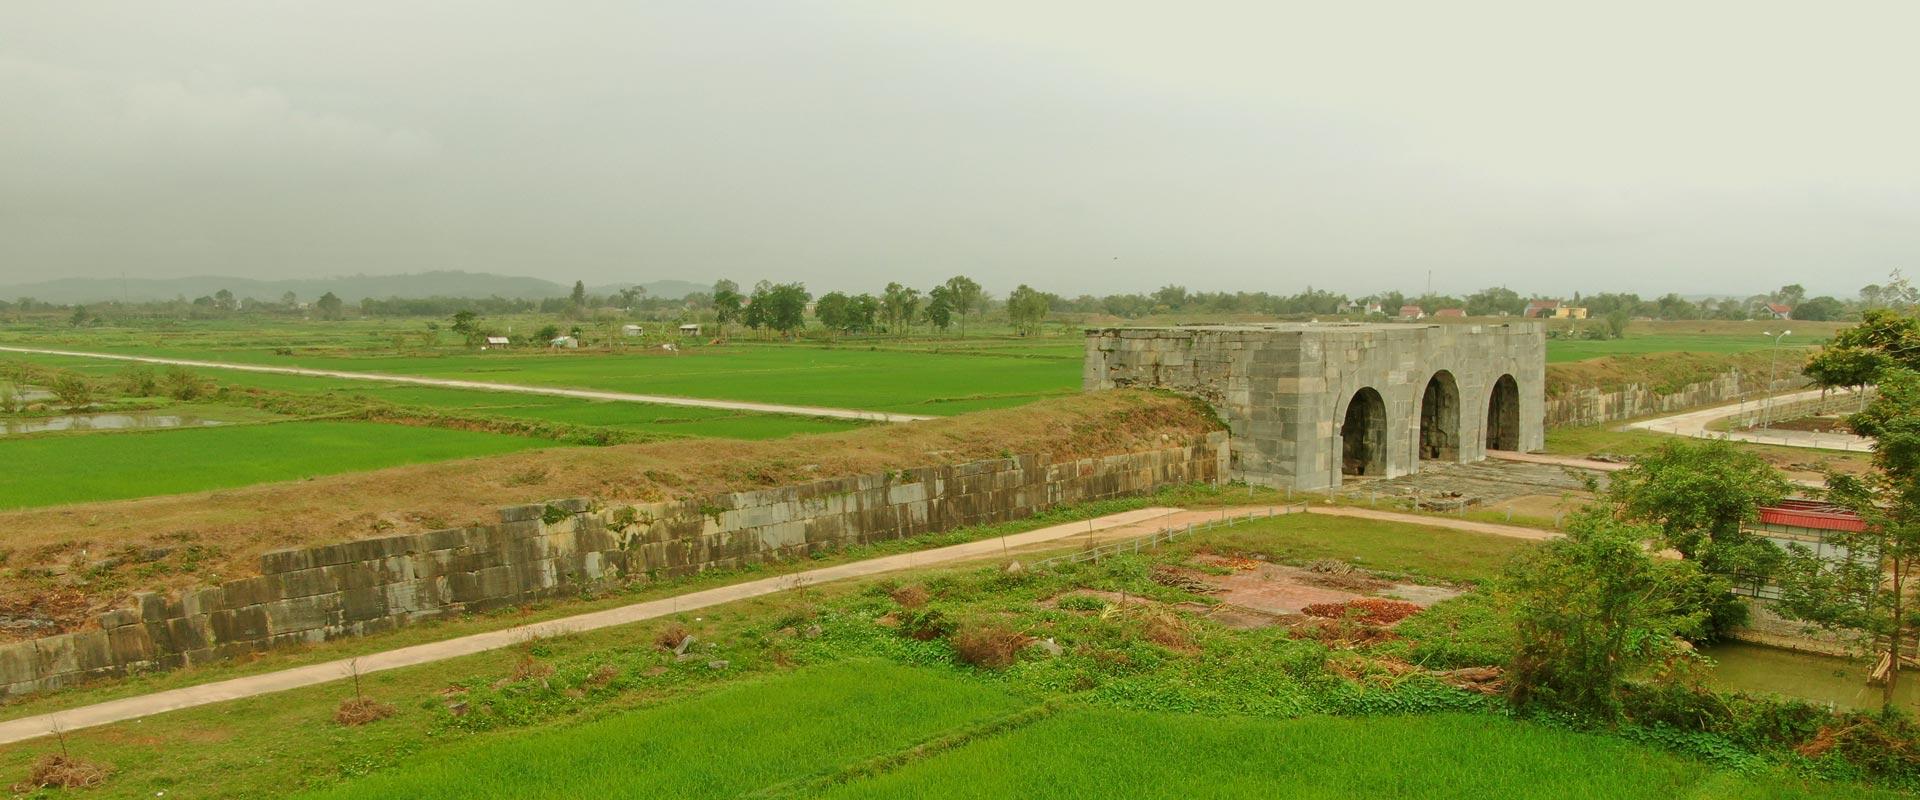 Citadelle de la dynastie Hô à Thanh Hoa